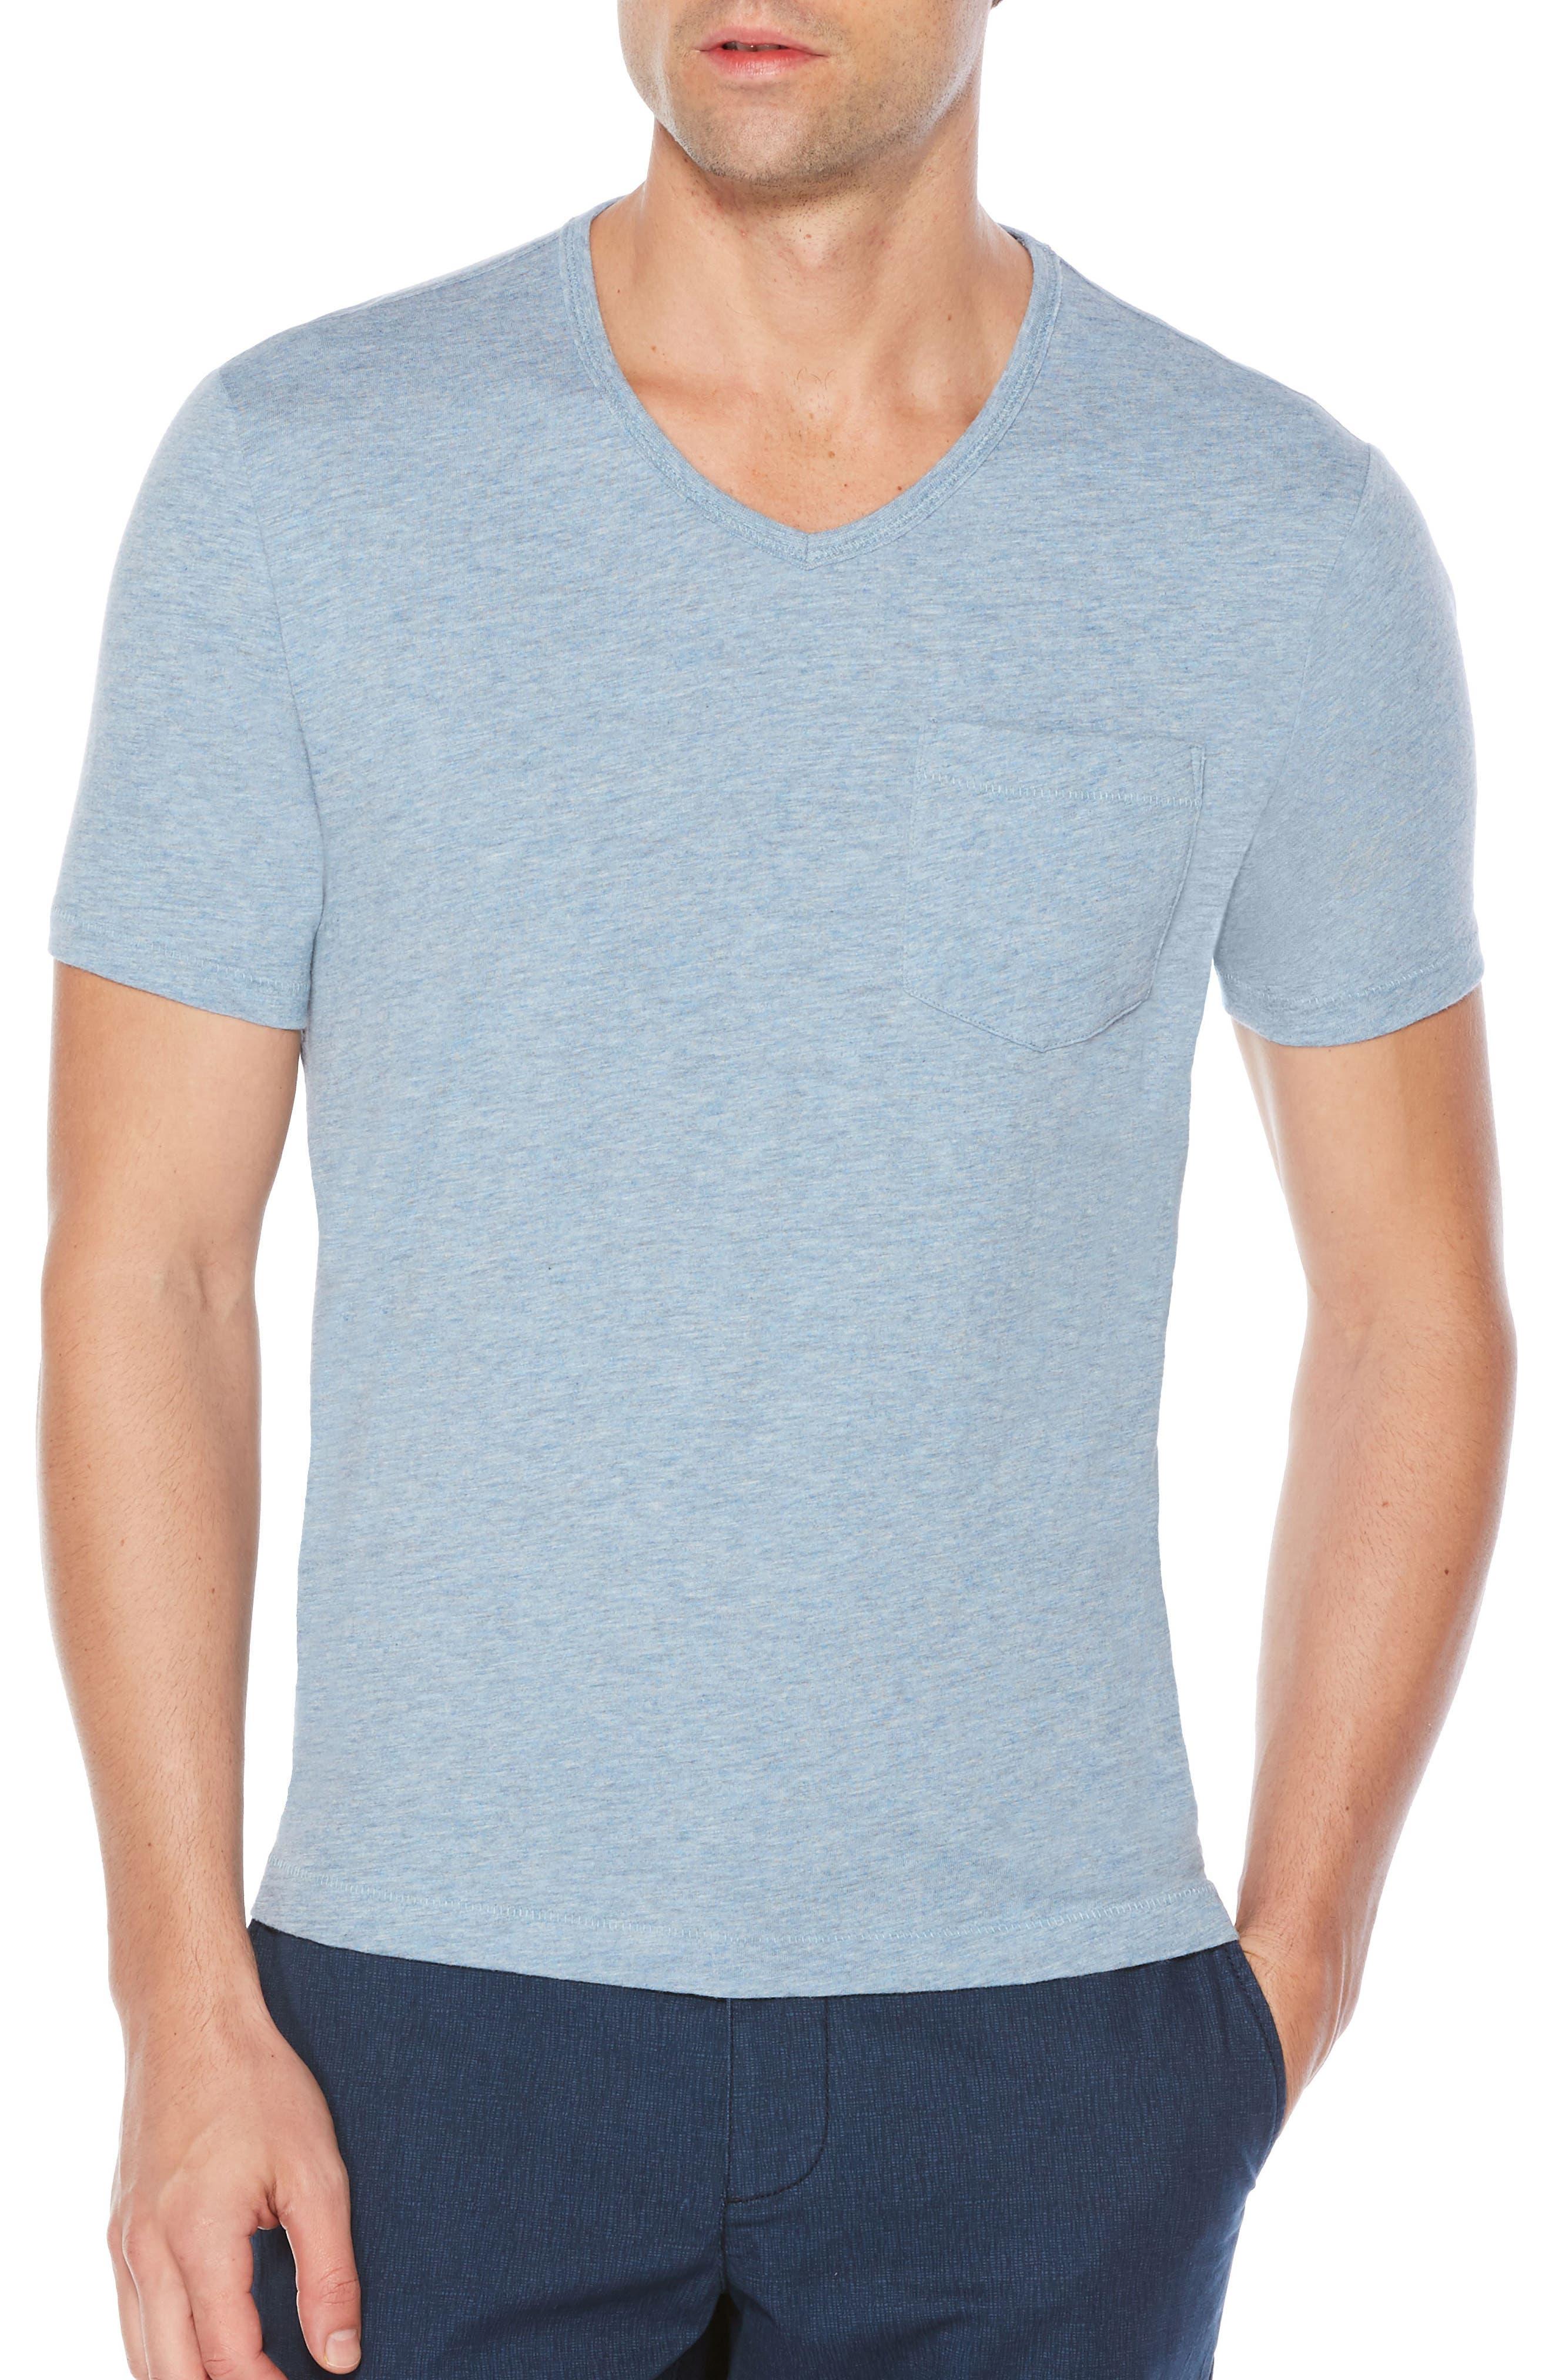 Main Image - Original Penguin Bing V-Neck T-Shirt